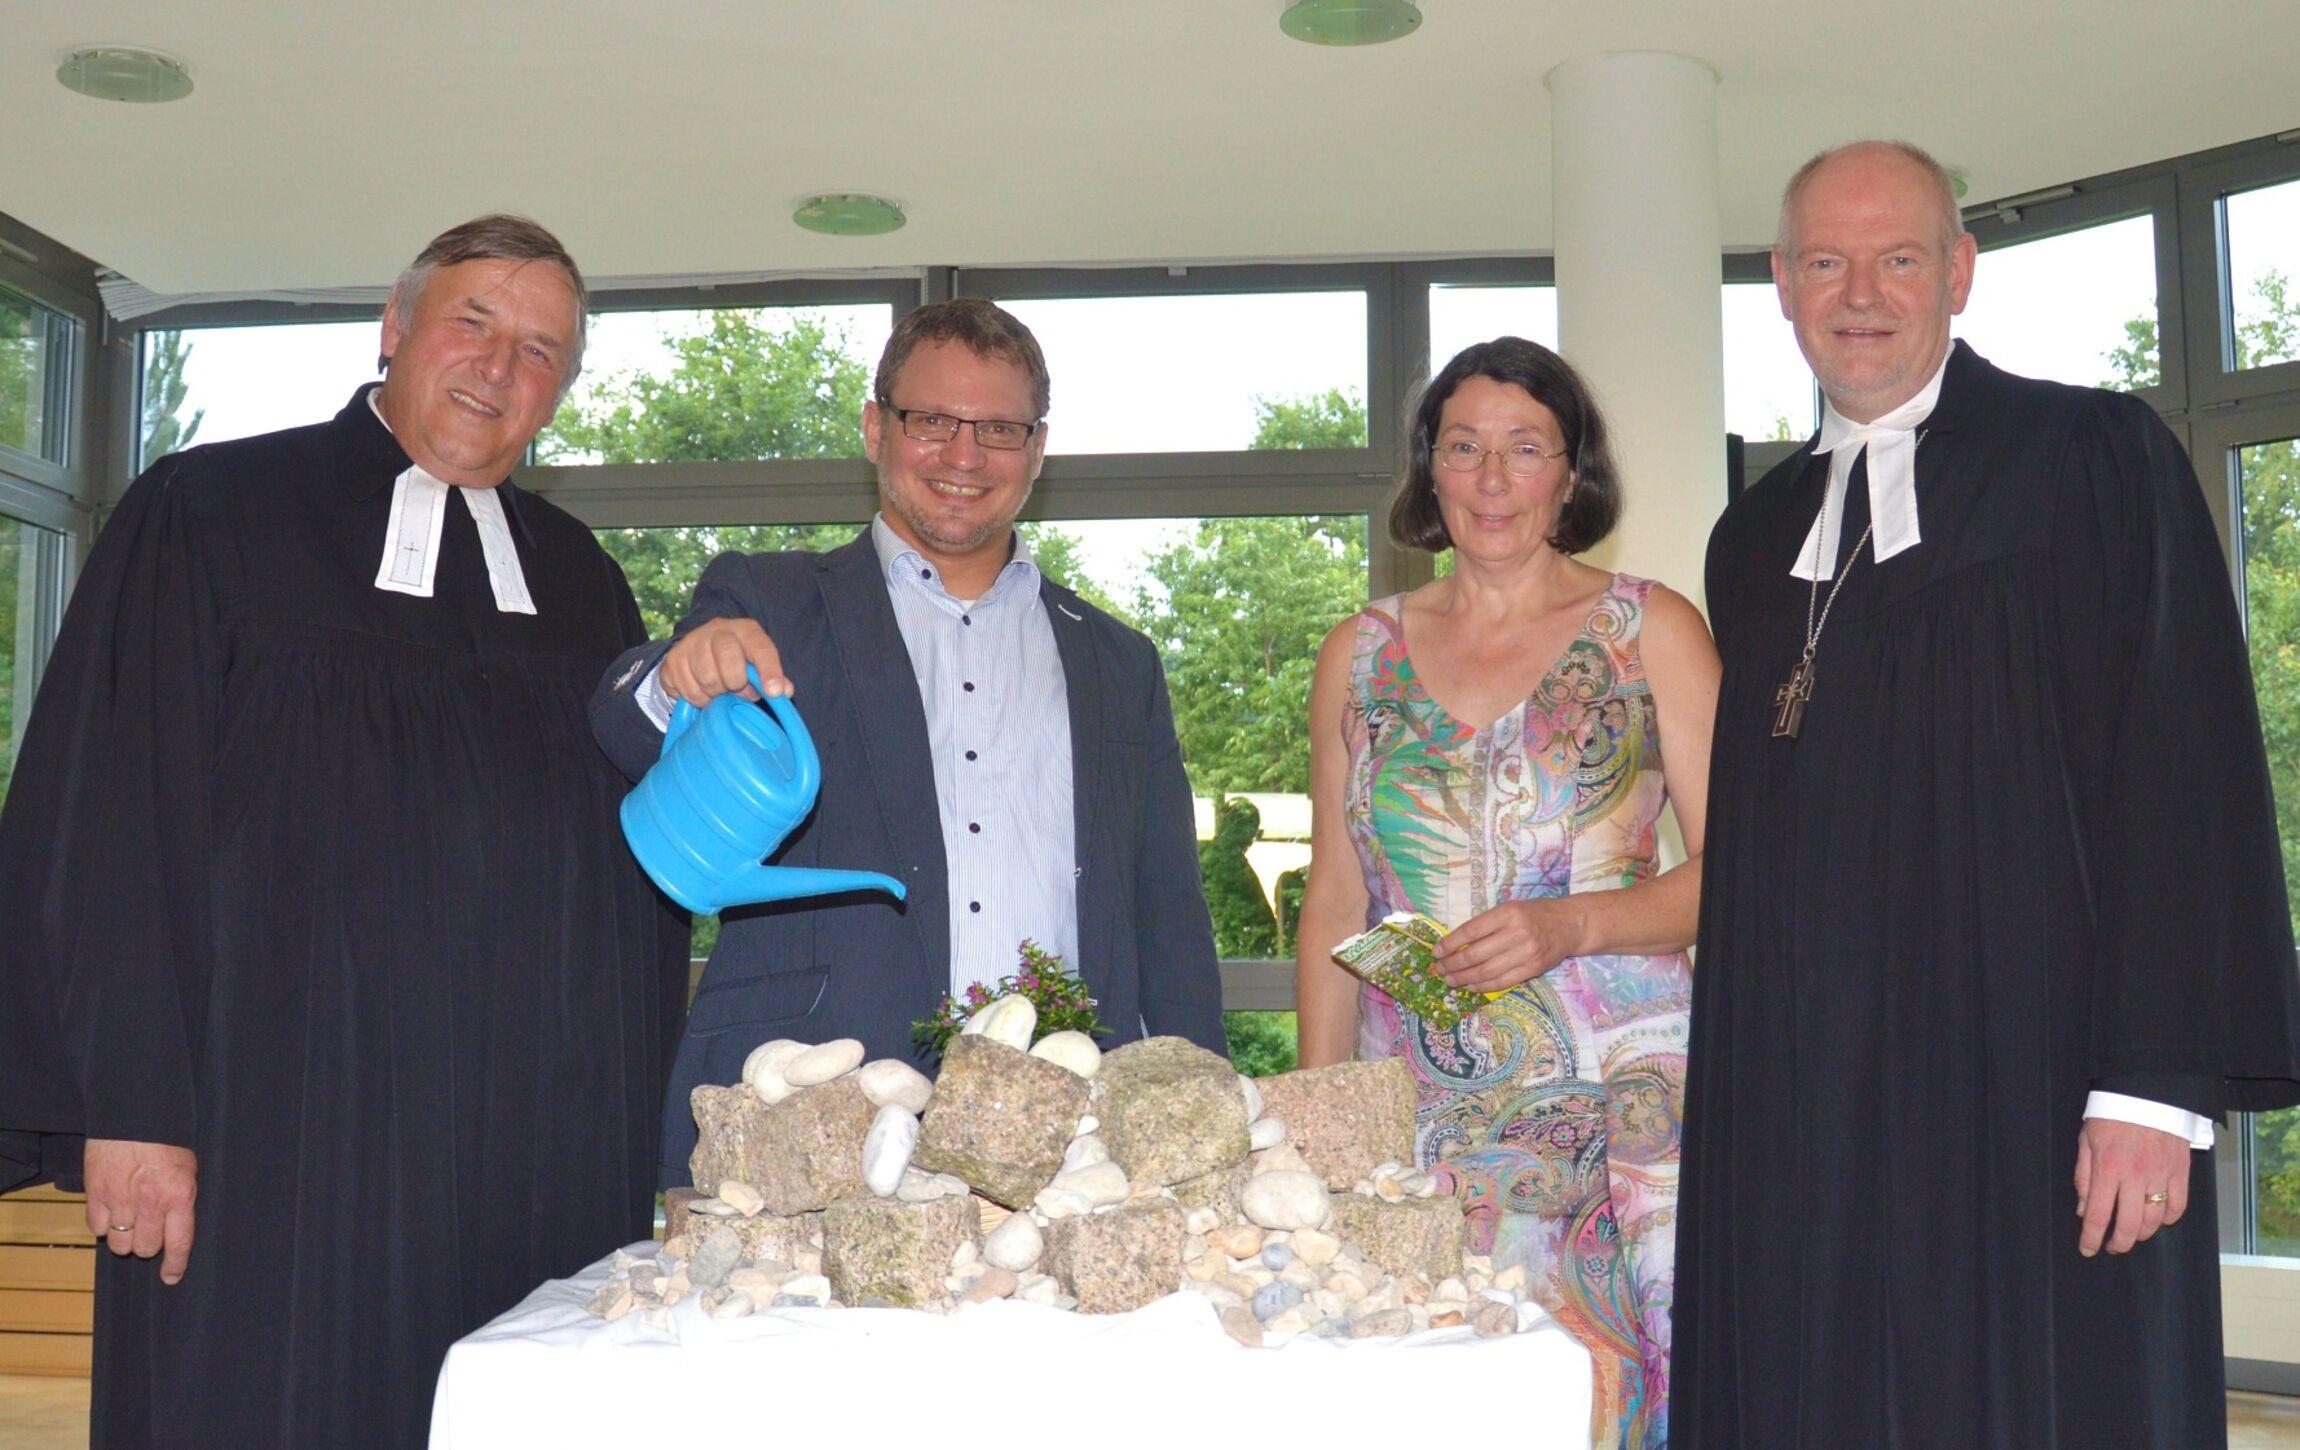 Superintendent Volkmar Keil, André Dittmann, Doris Iß